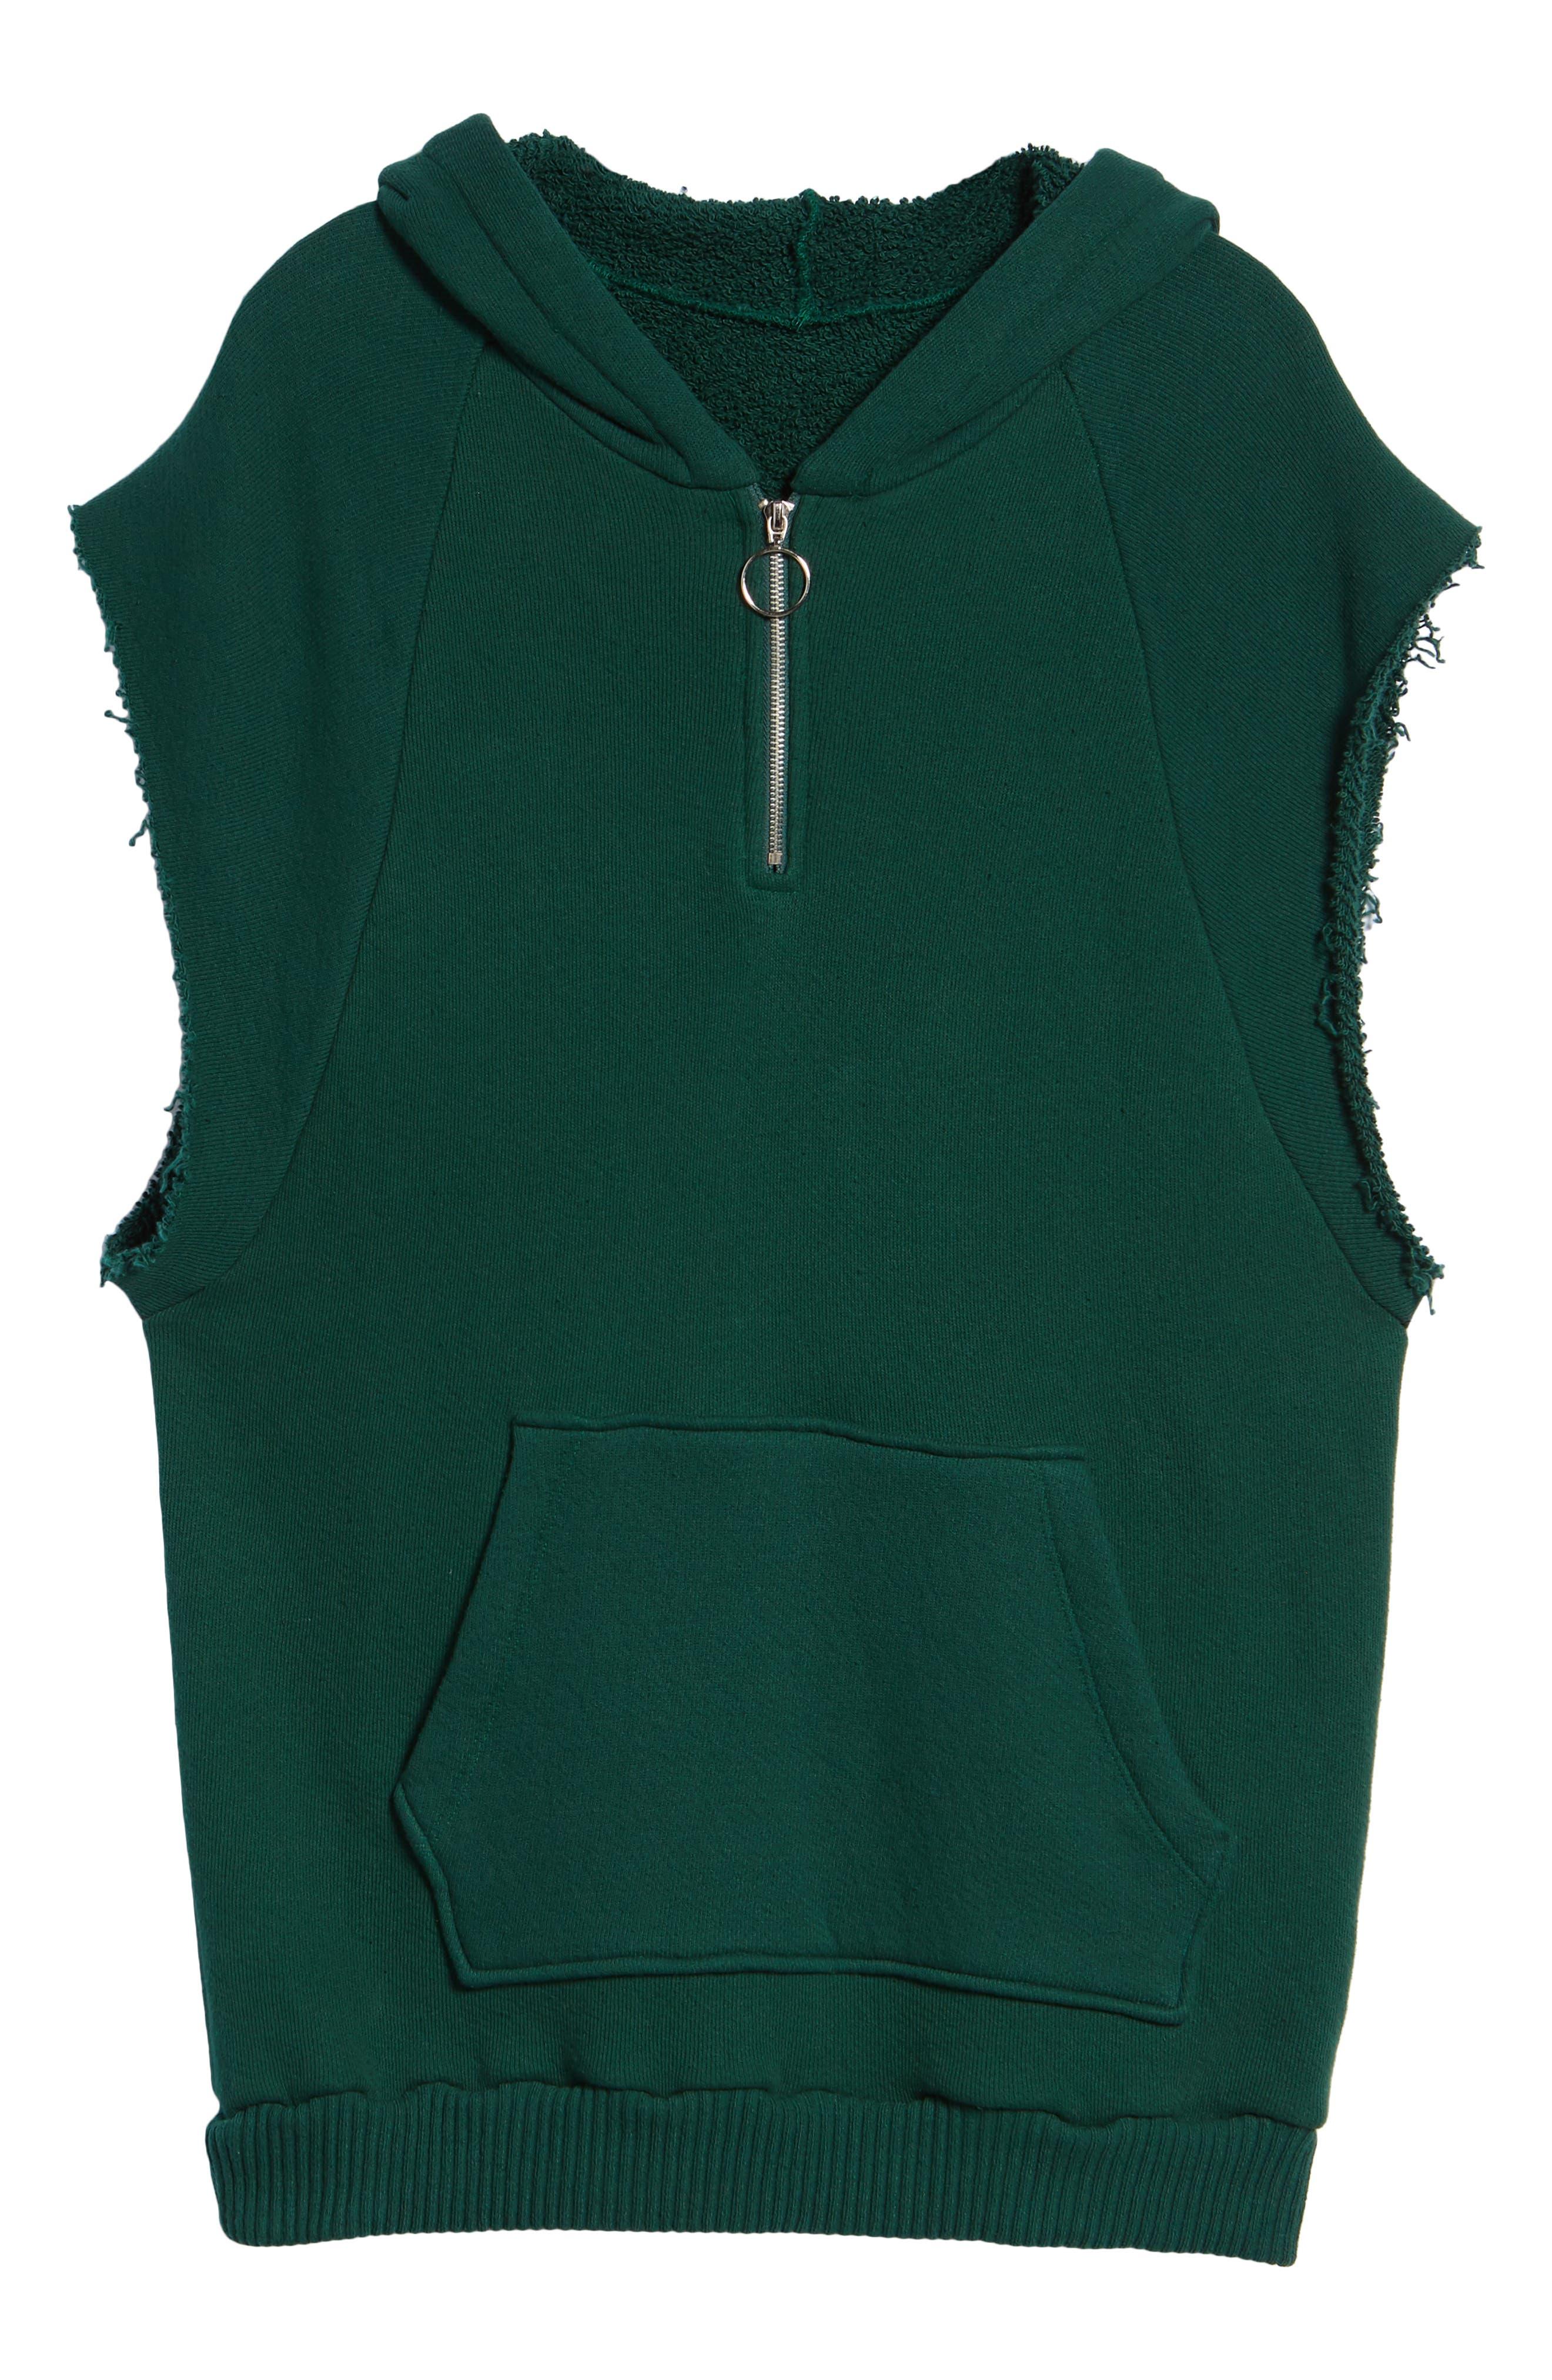 Warwick Quarter-Zip Hoodie Sweatshirt,                             Alternate thumbnail 6, color,                             HUNTER GREEN